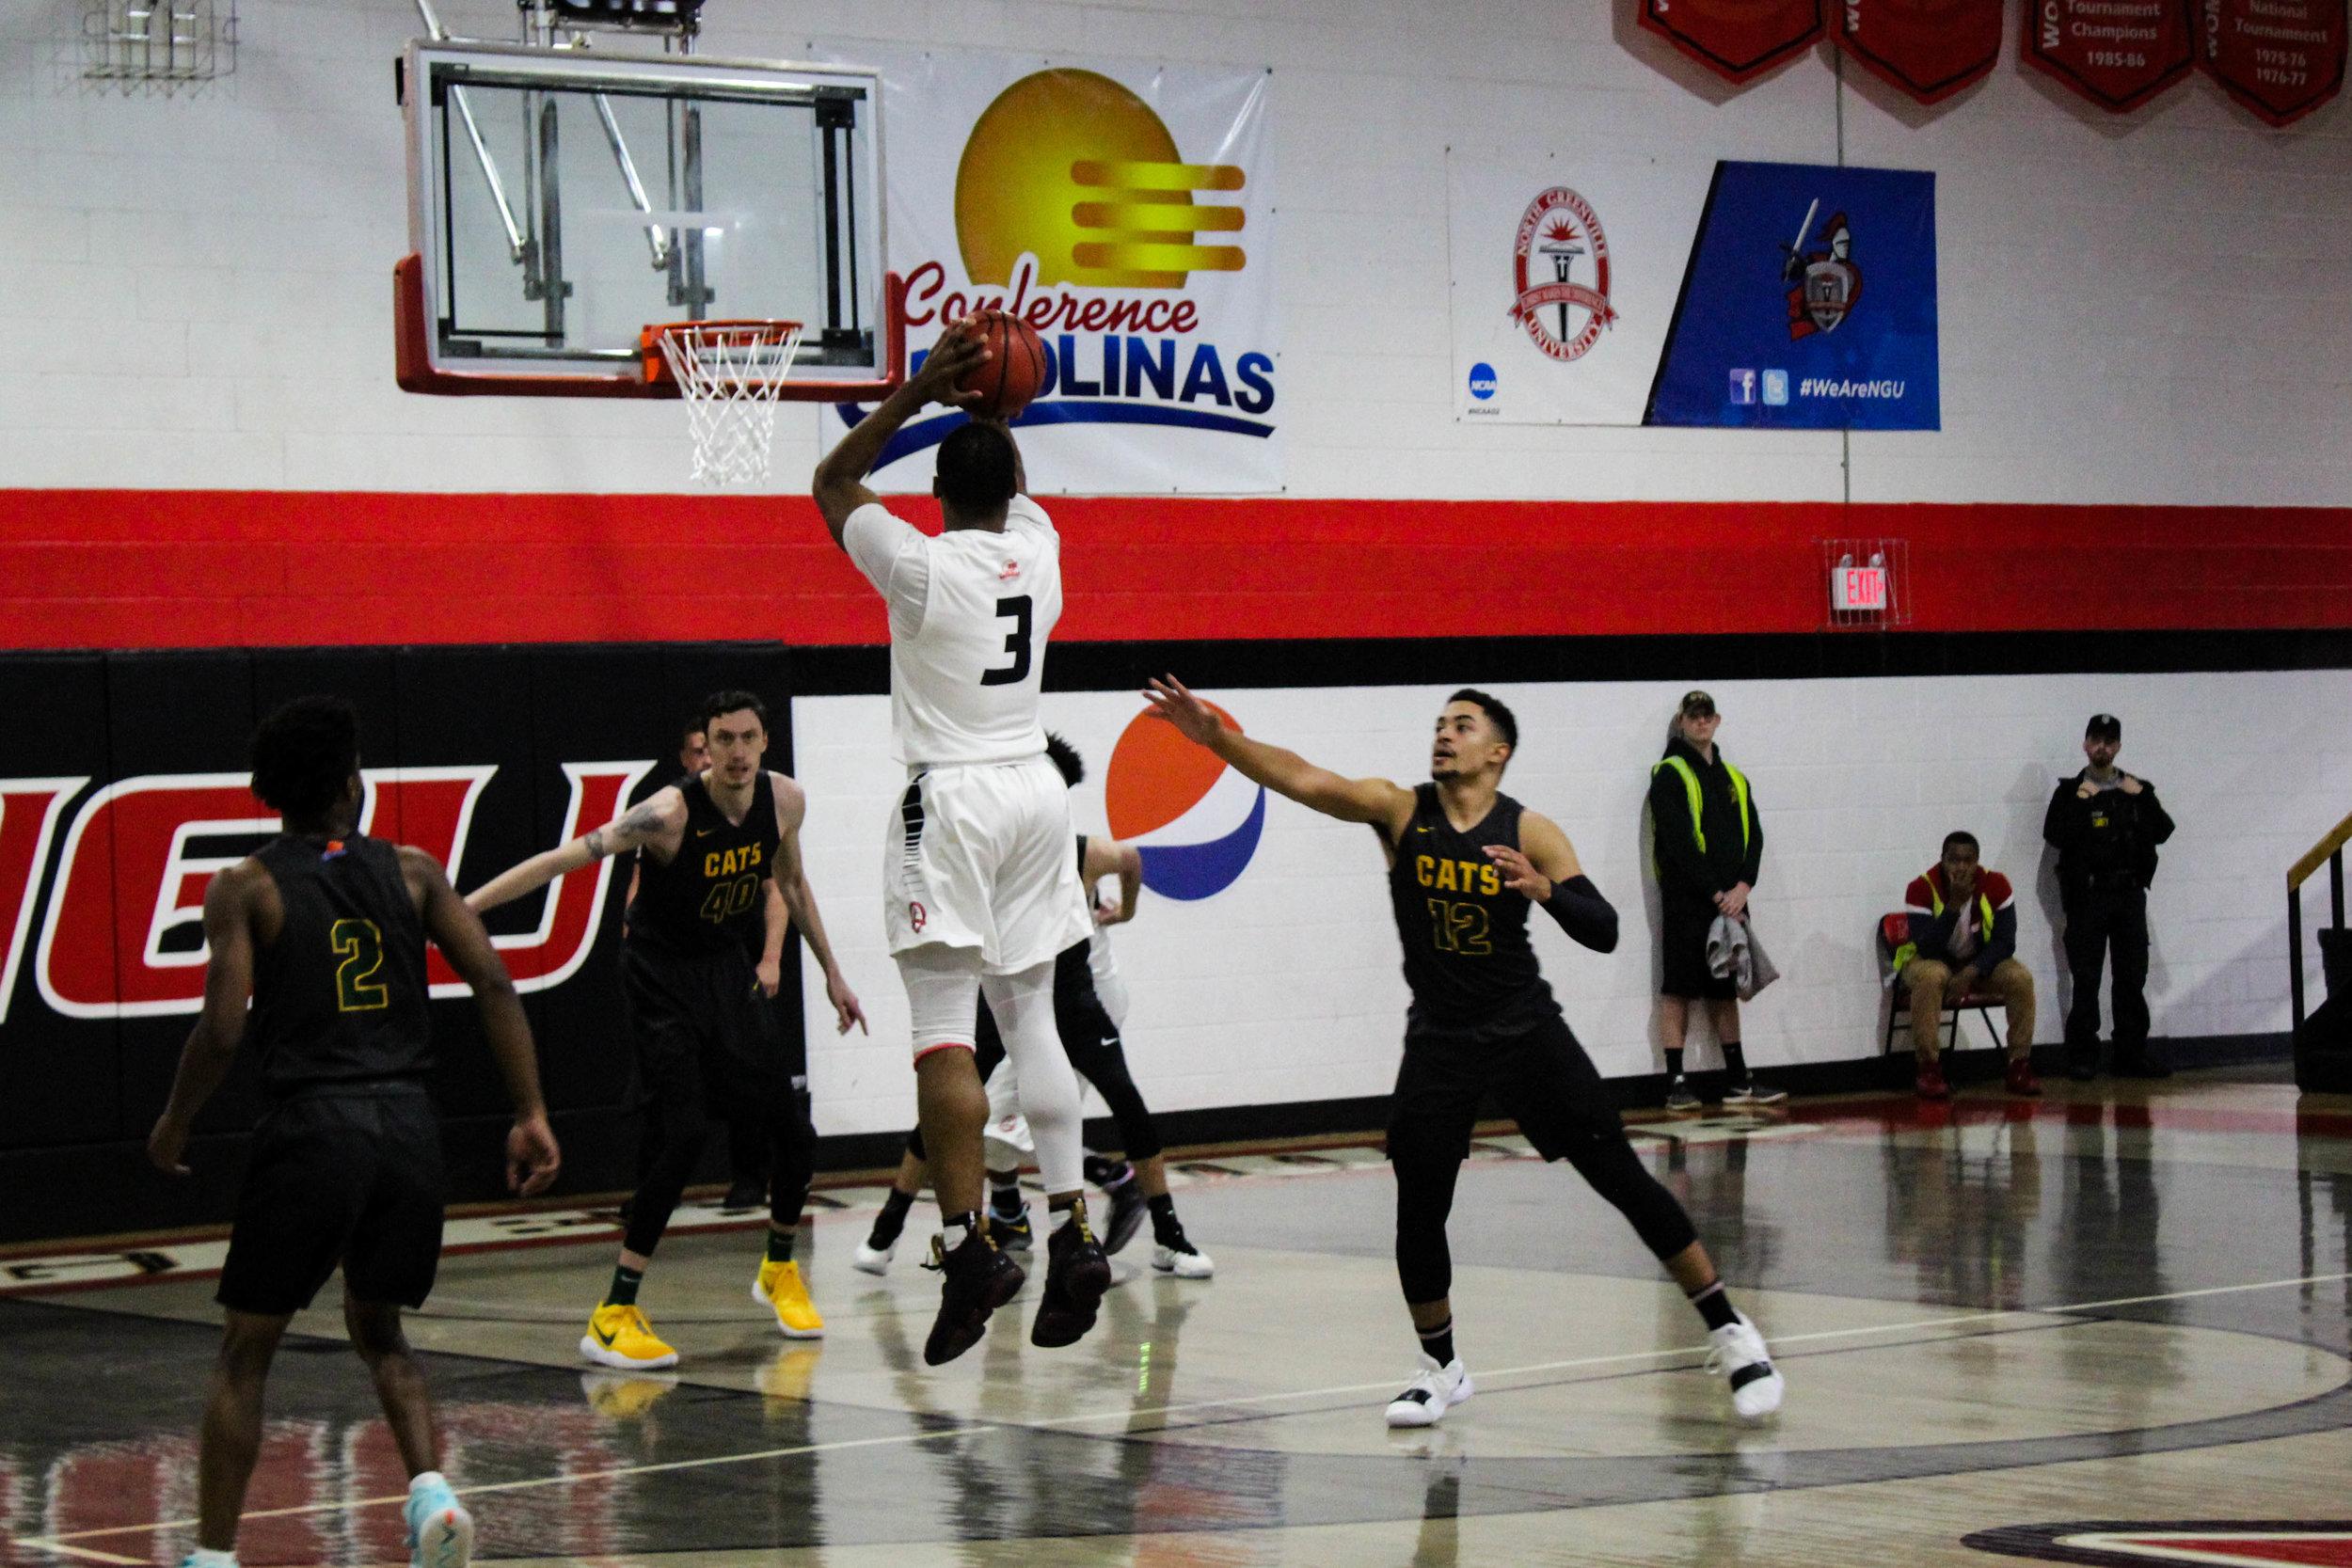 Sophomore Kovi Tate (3) jumps to shoot a three pointer.